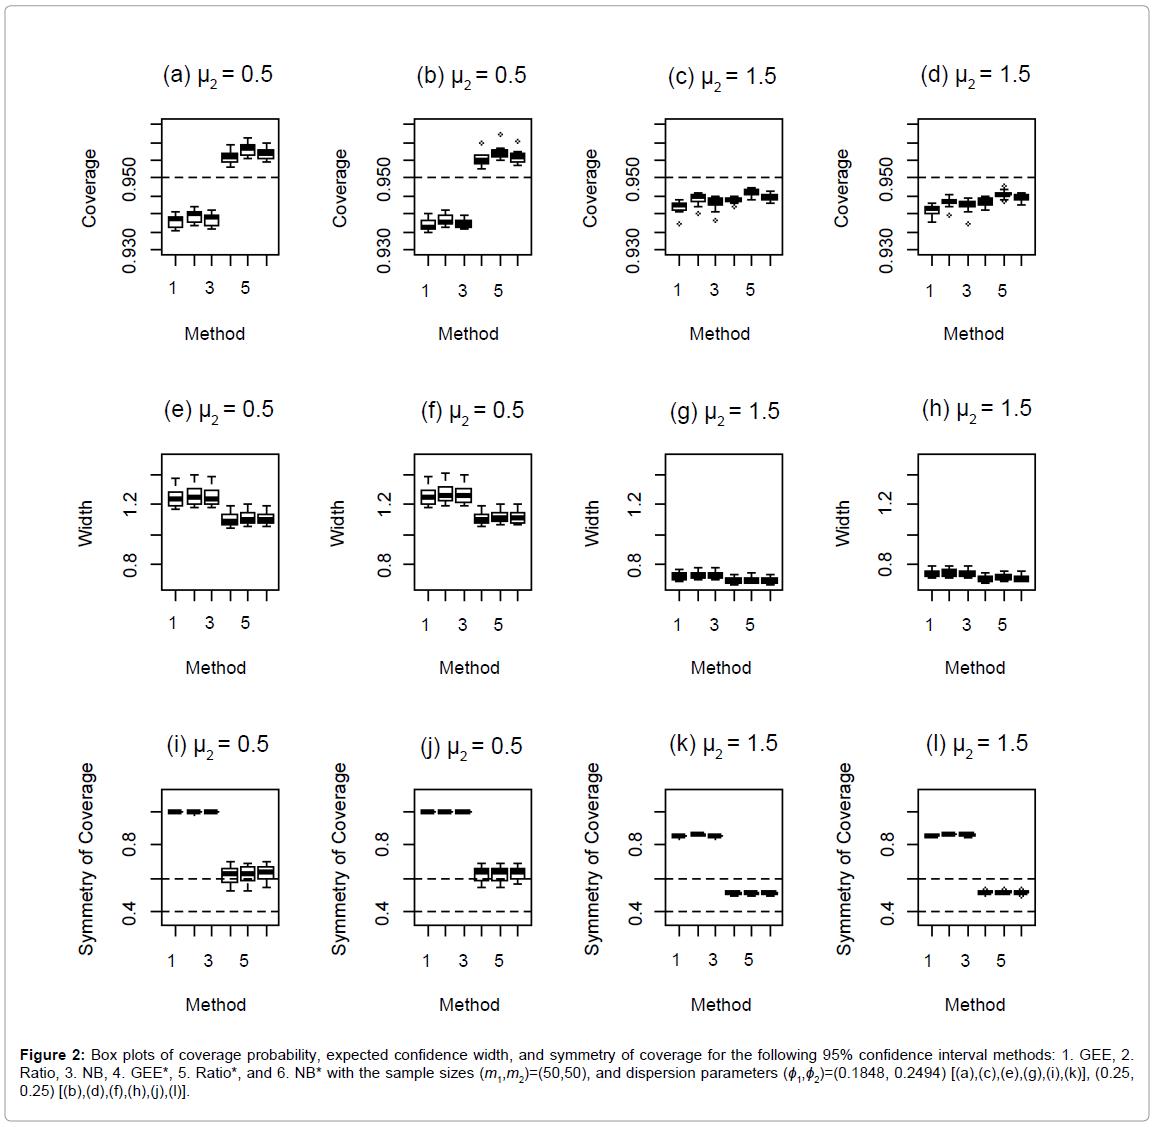 biometrics-biostatistics-box-plots-coverage